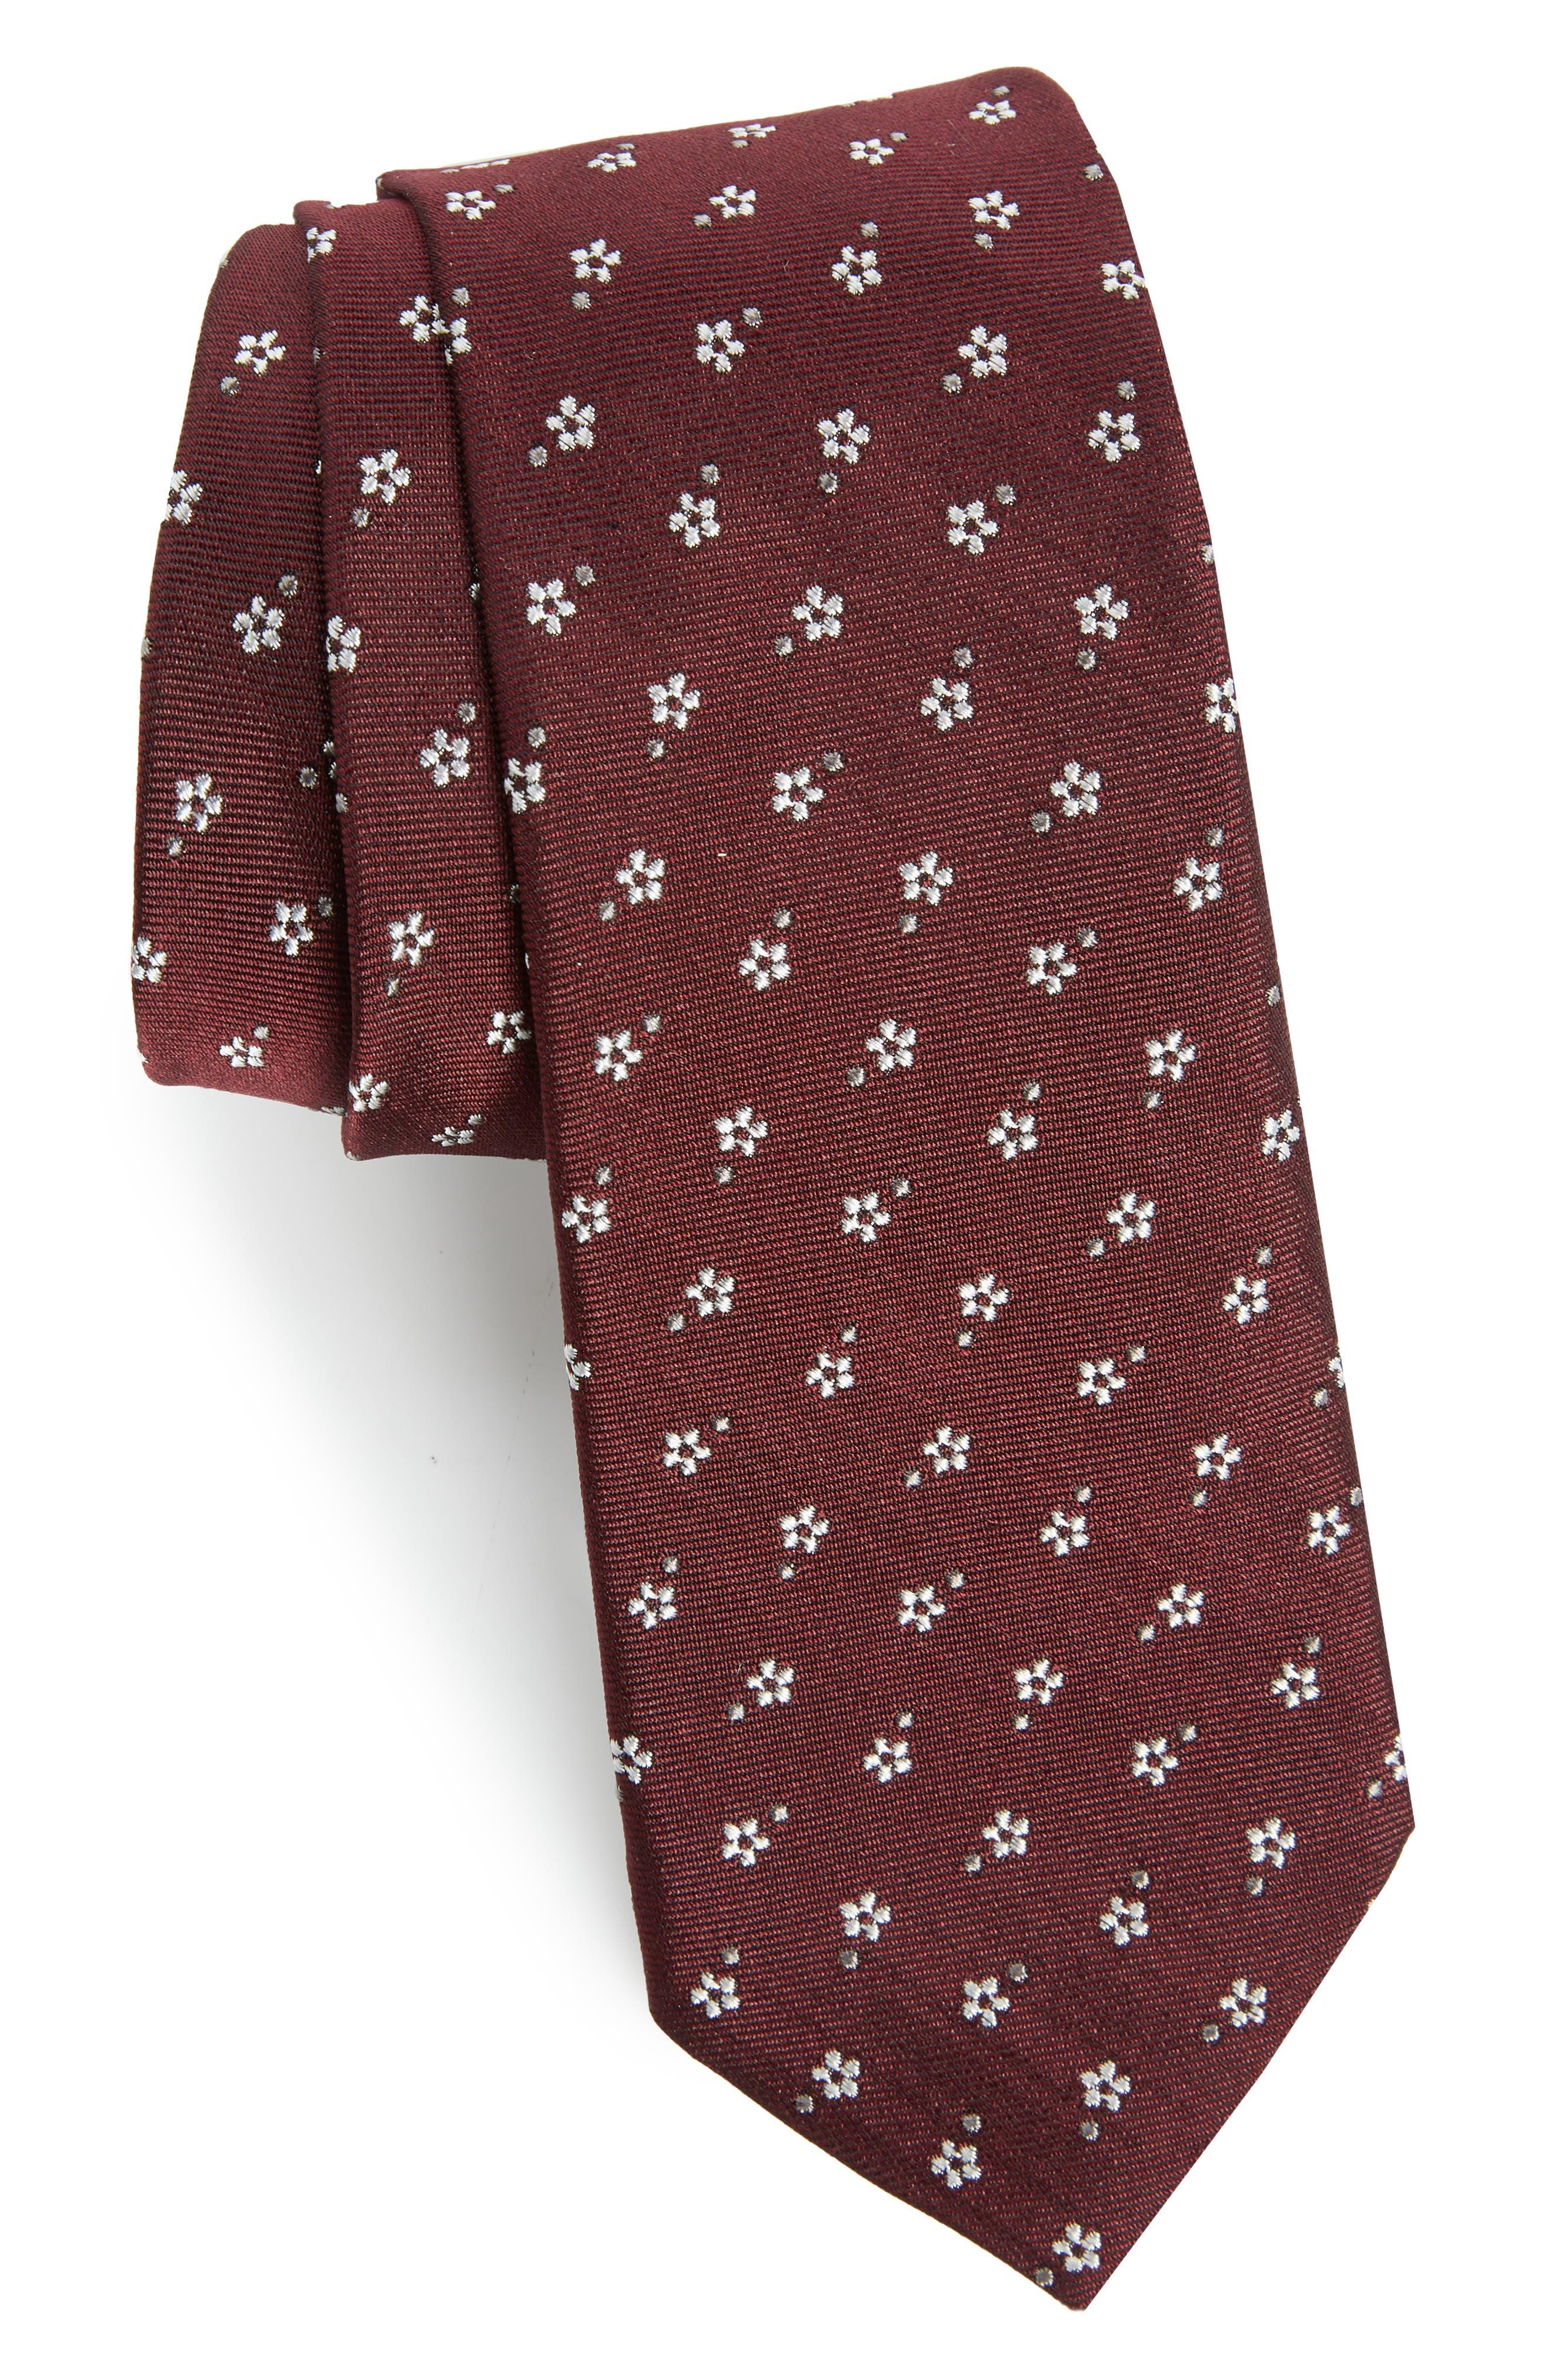 Floral Print Skinny Tie,                         Main,                         color, Burgundy/ Bordeaux